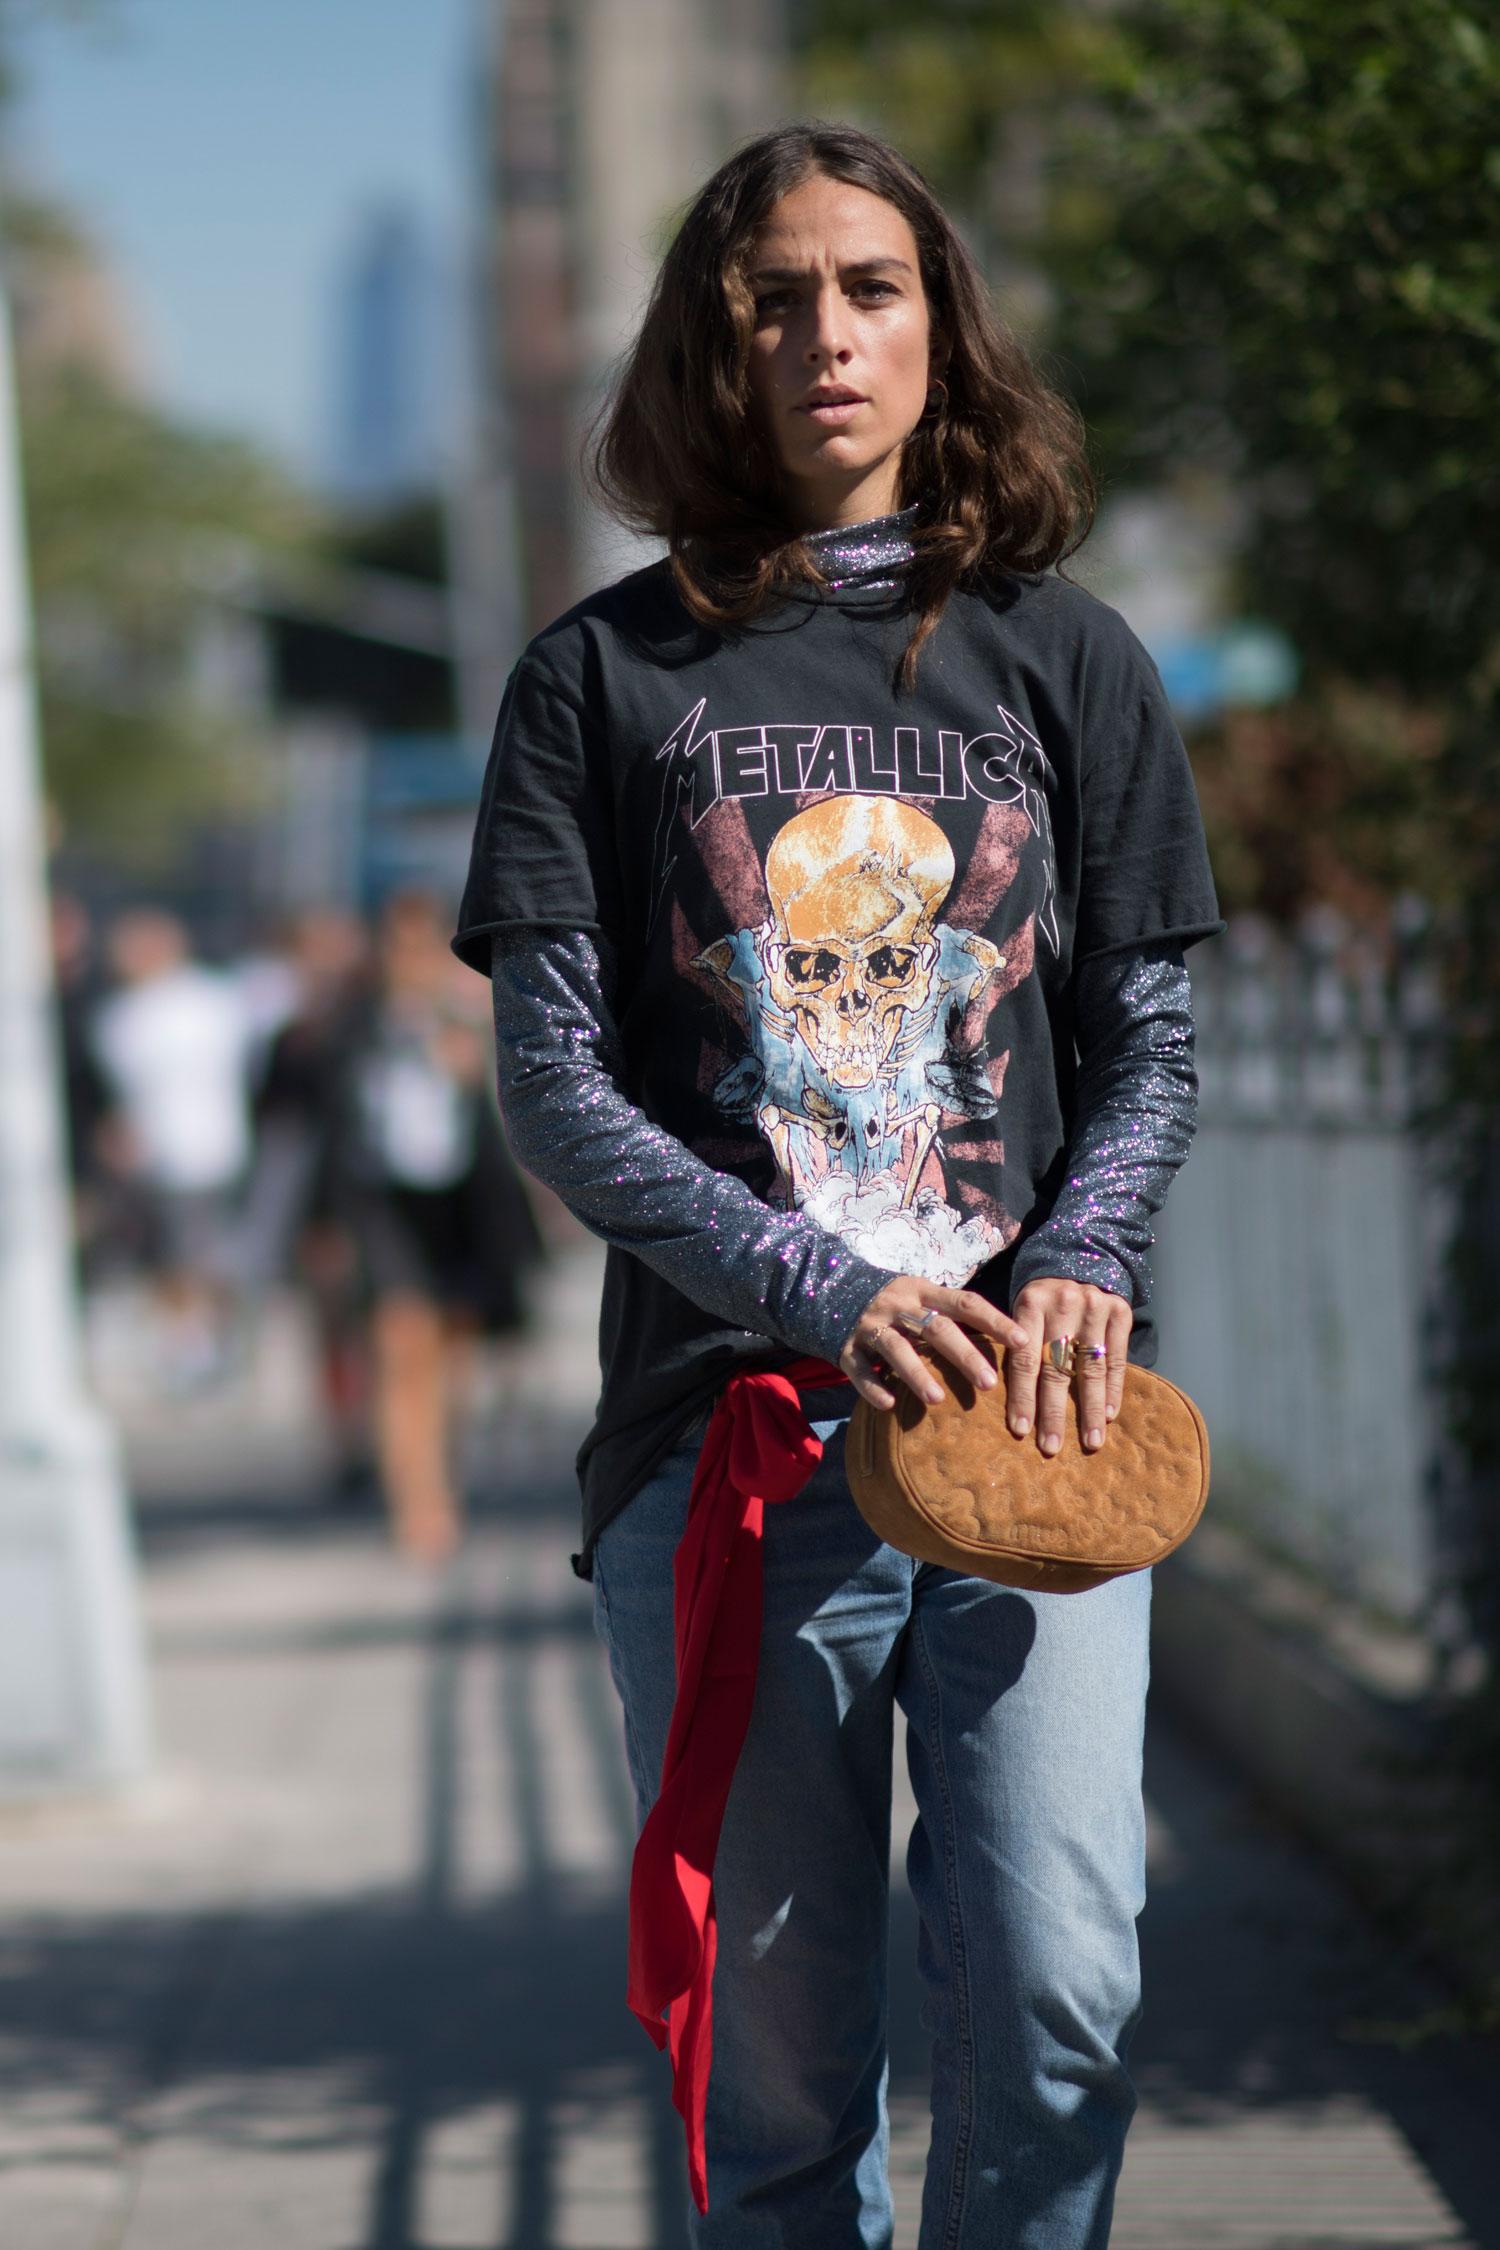 trend-metal-shirt-street-style-04